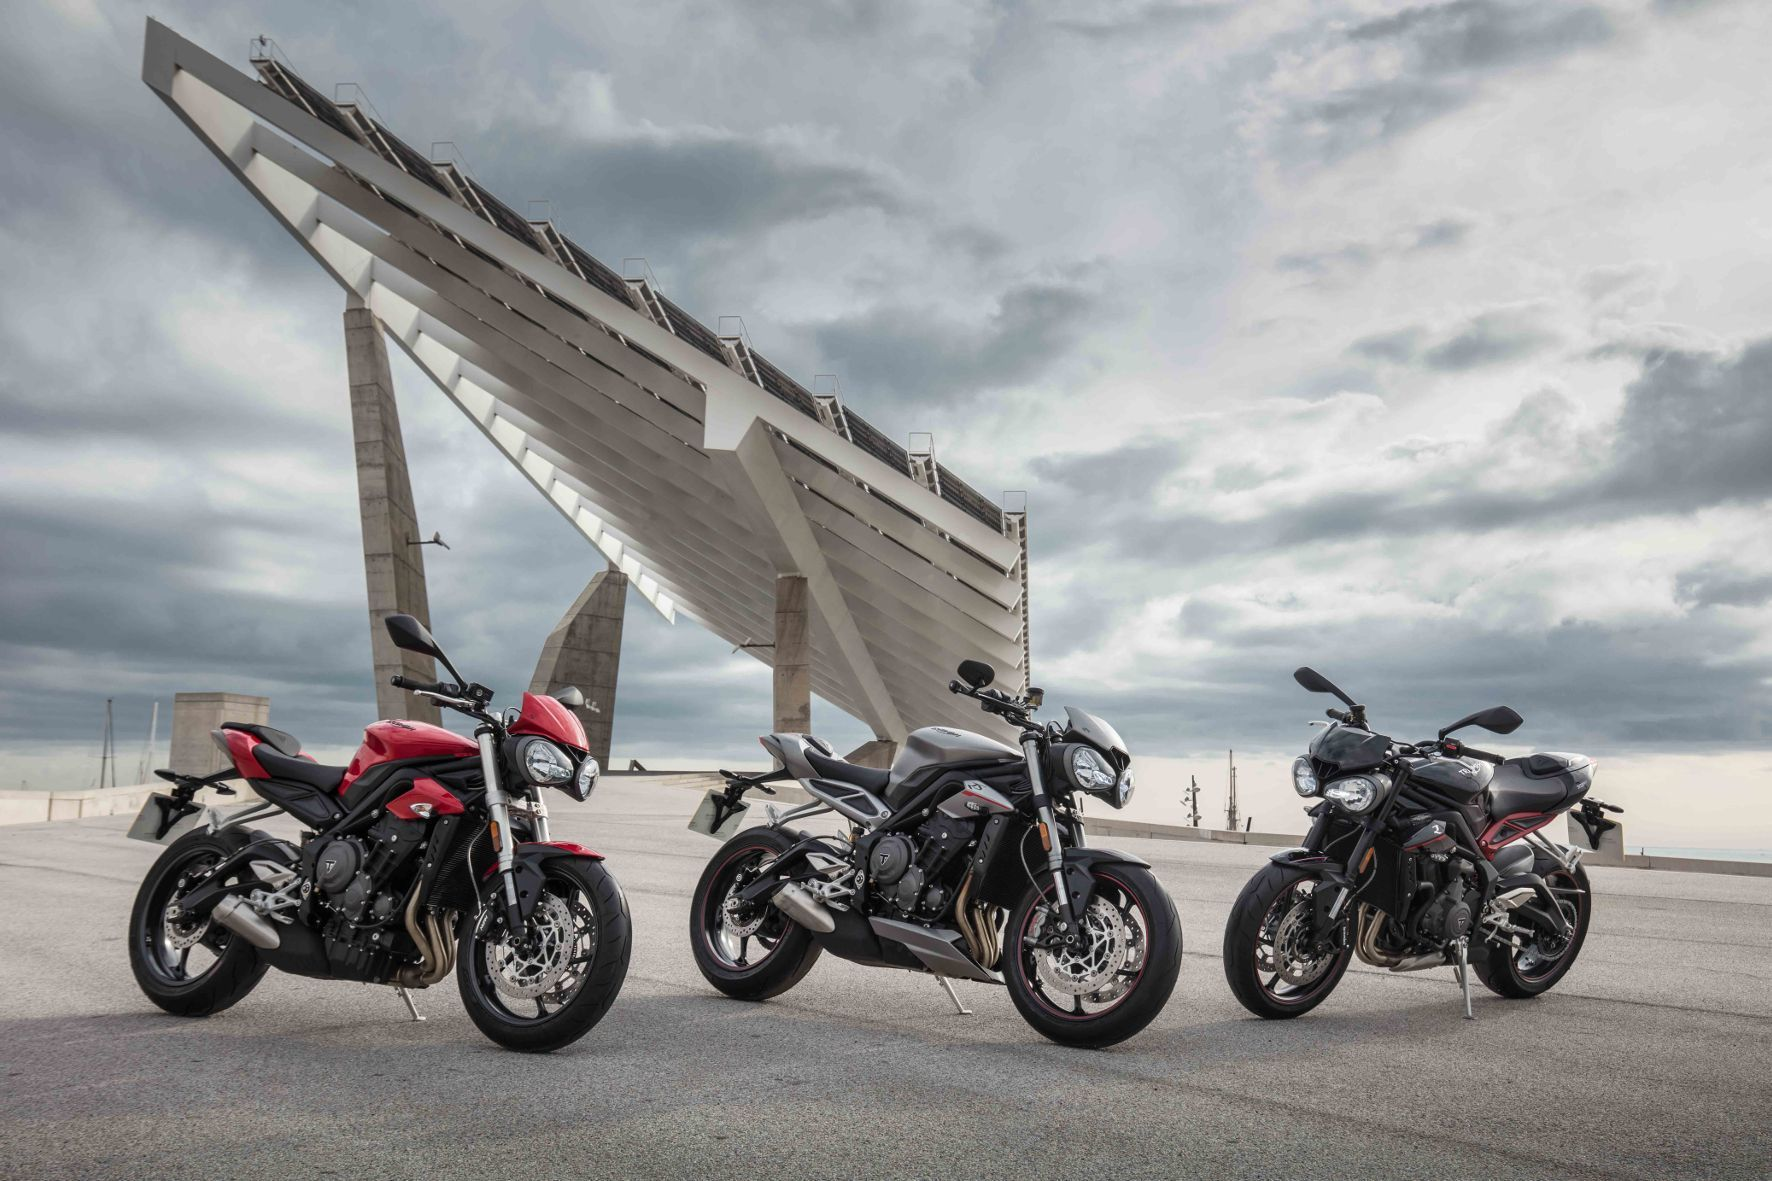 mid Groß-Gerau - Triumphs 2017er Speed Triple-Familie: S, R und RS (v.l.)